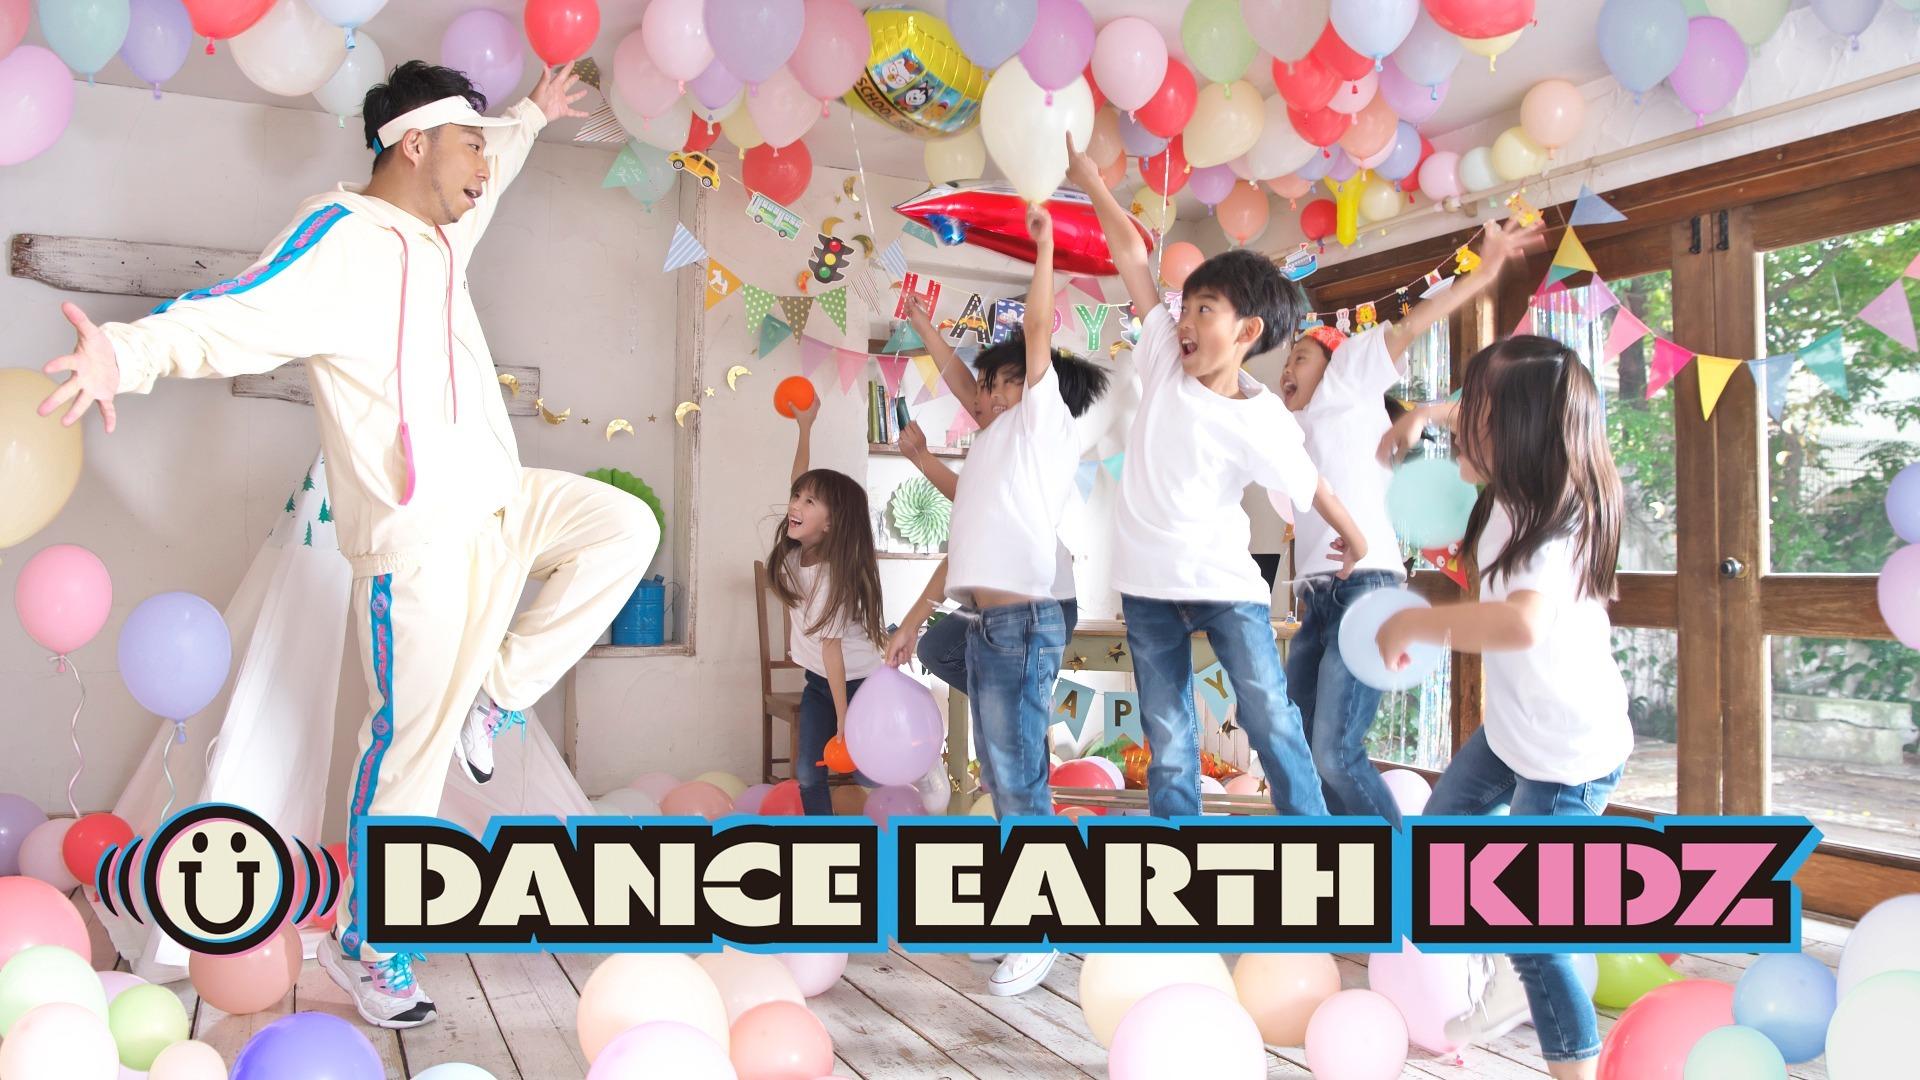 DANCE EARTH KIDZ(ダンスアースキッズ)